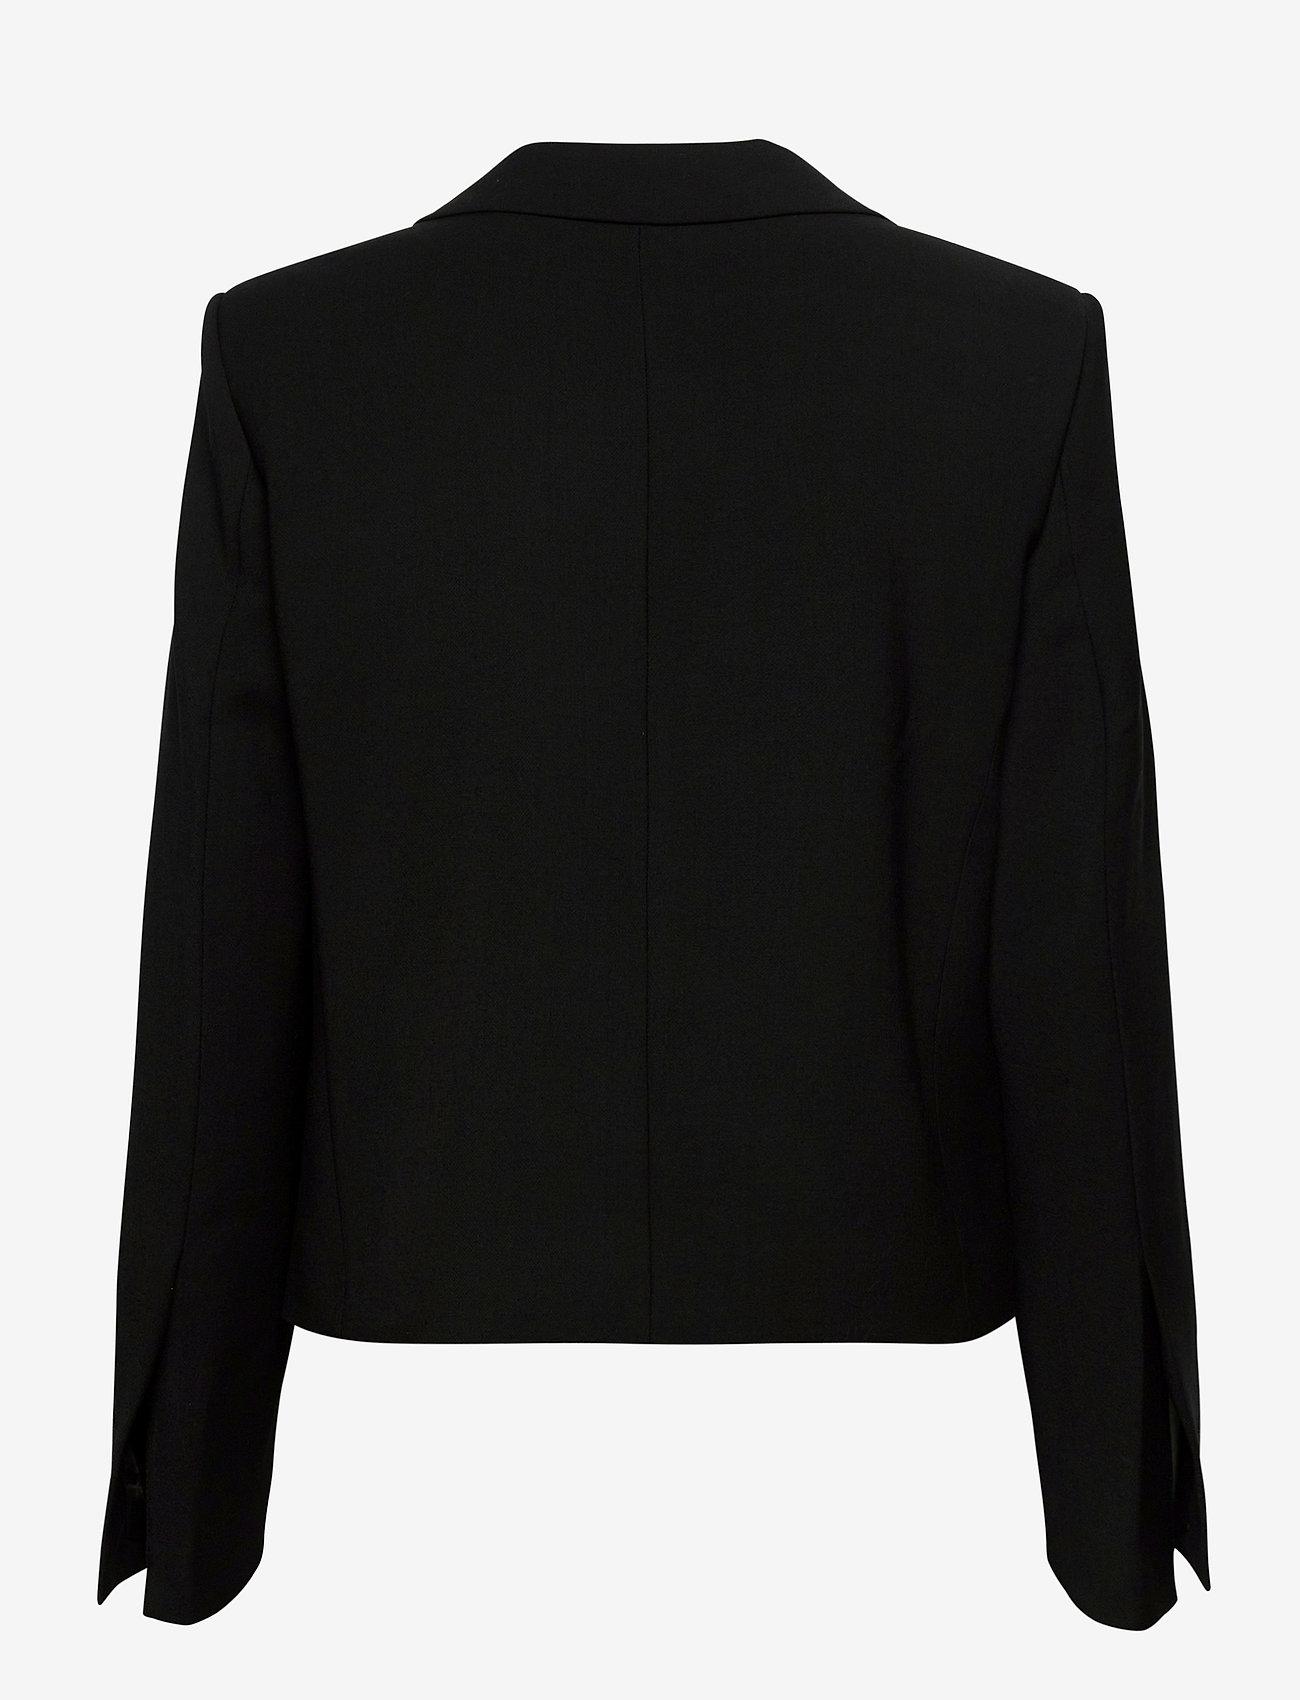 Totême - ANDRANO - getailleerde blazers - black 200 - 1